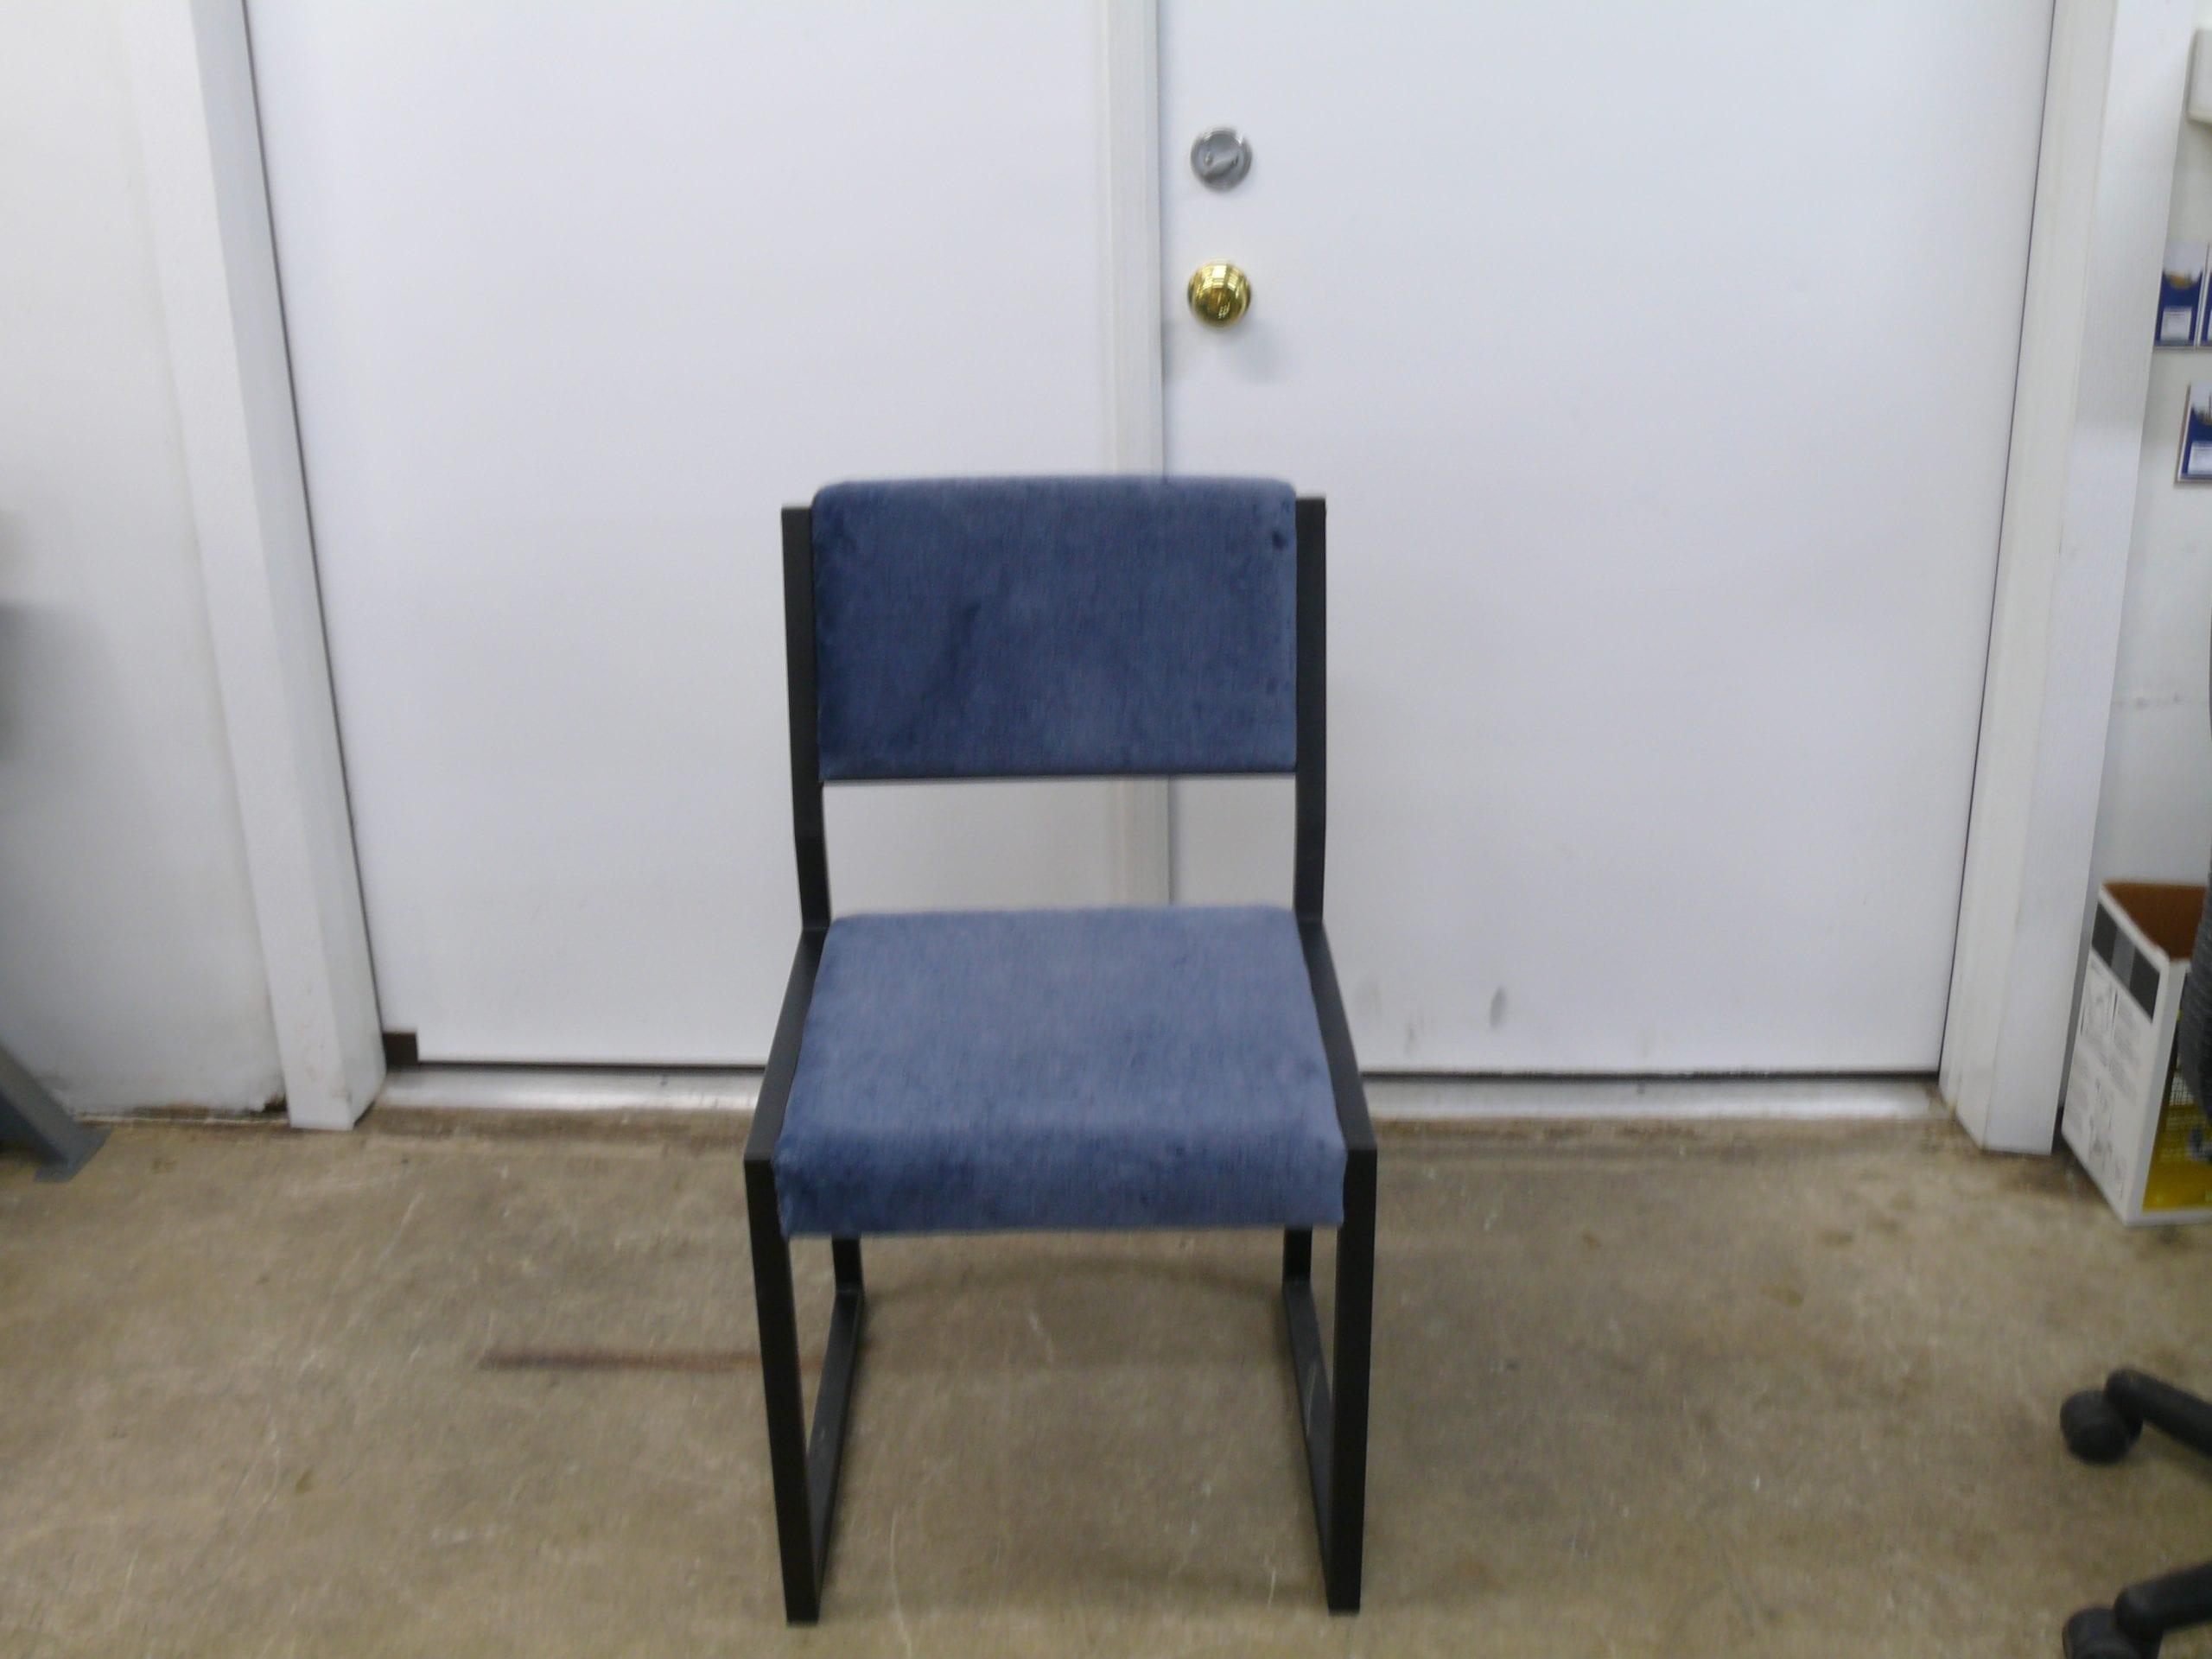 Upholstery Shop & Uhuru Design Bandholz Chair - Upholstery Shop - Quality ...